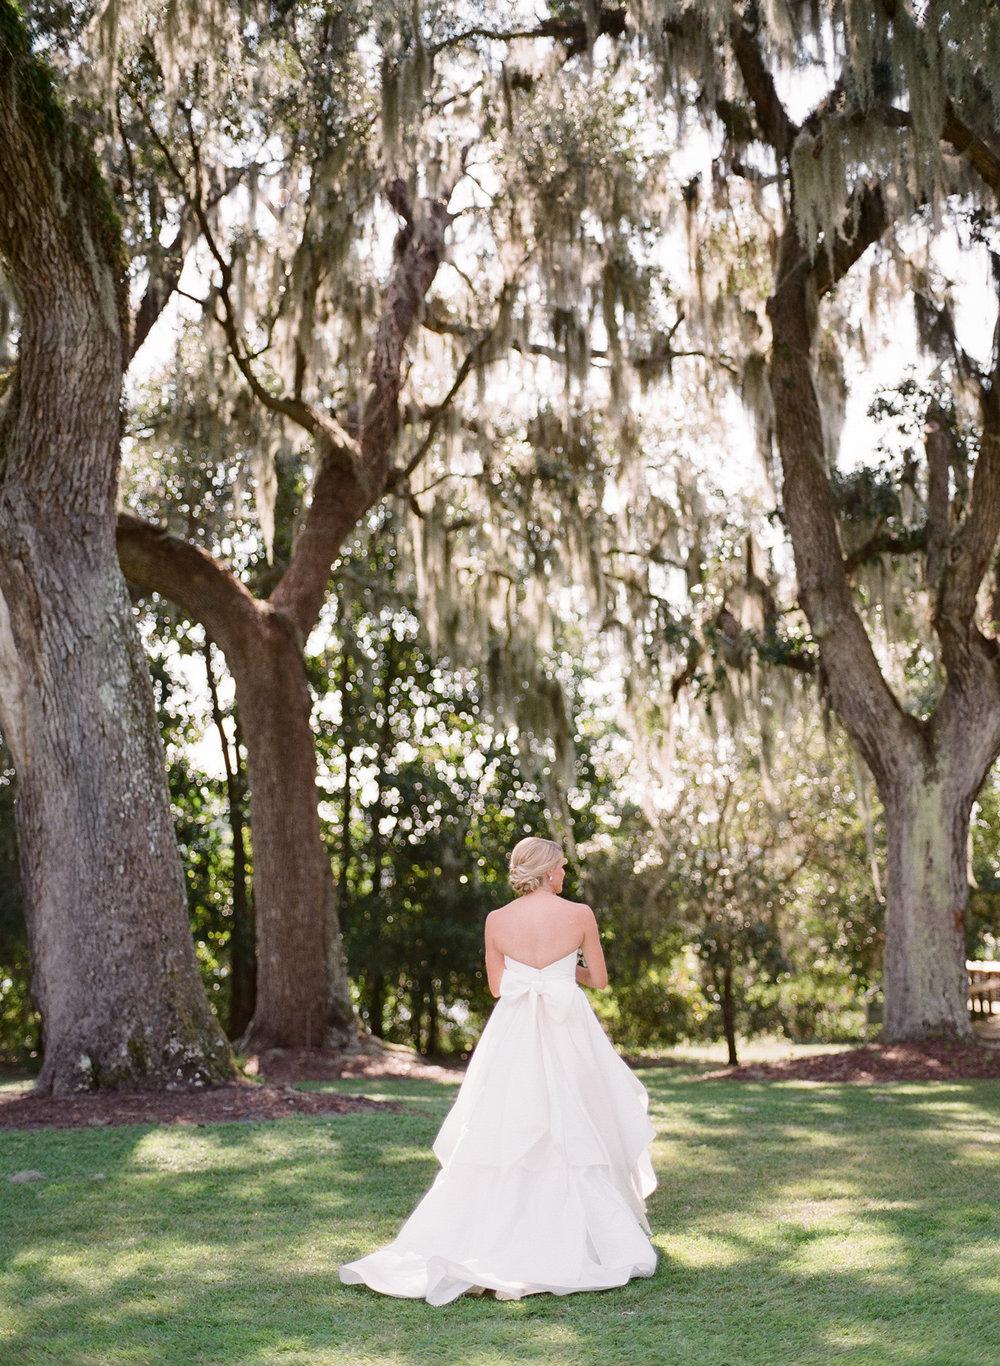 Airlie-Gardens-Wedding-13.jpg